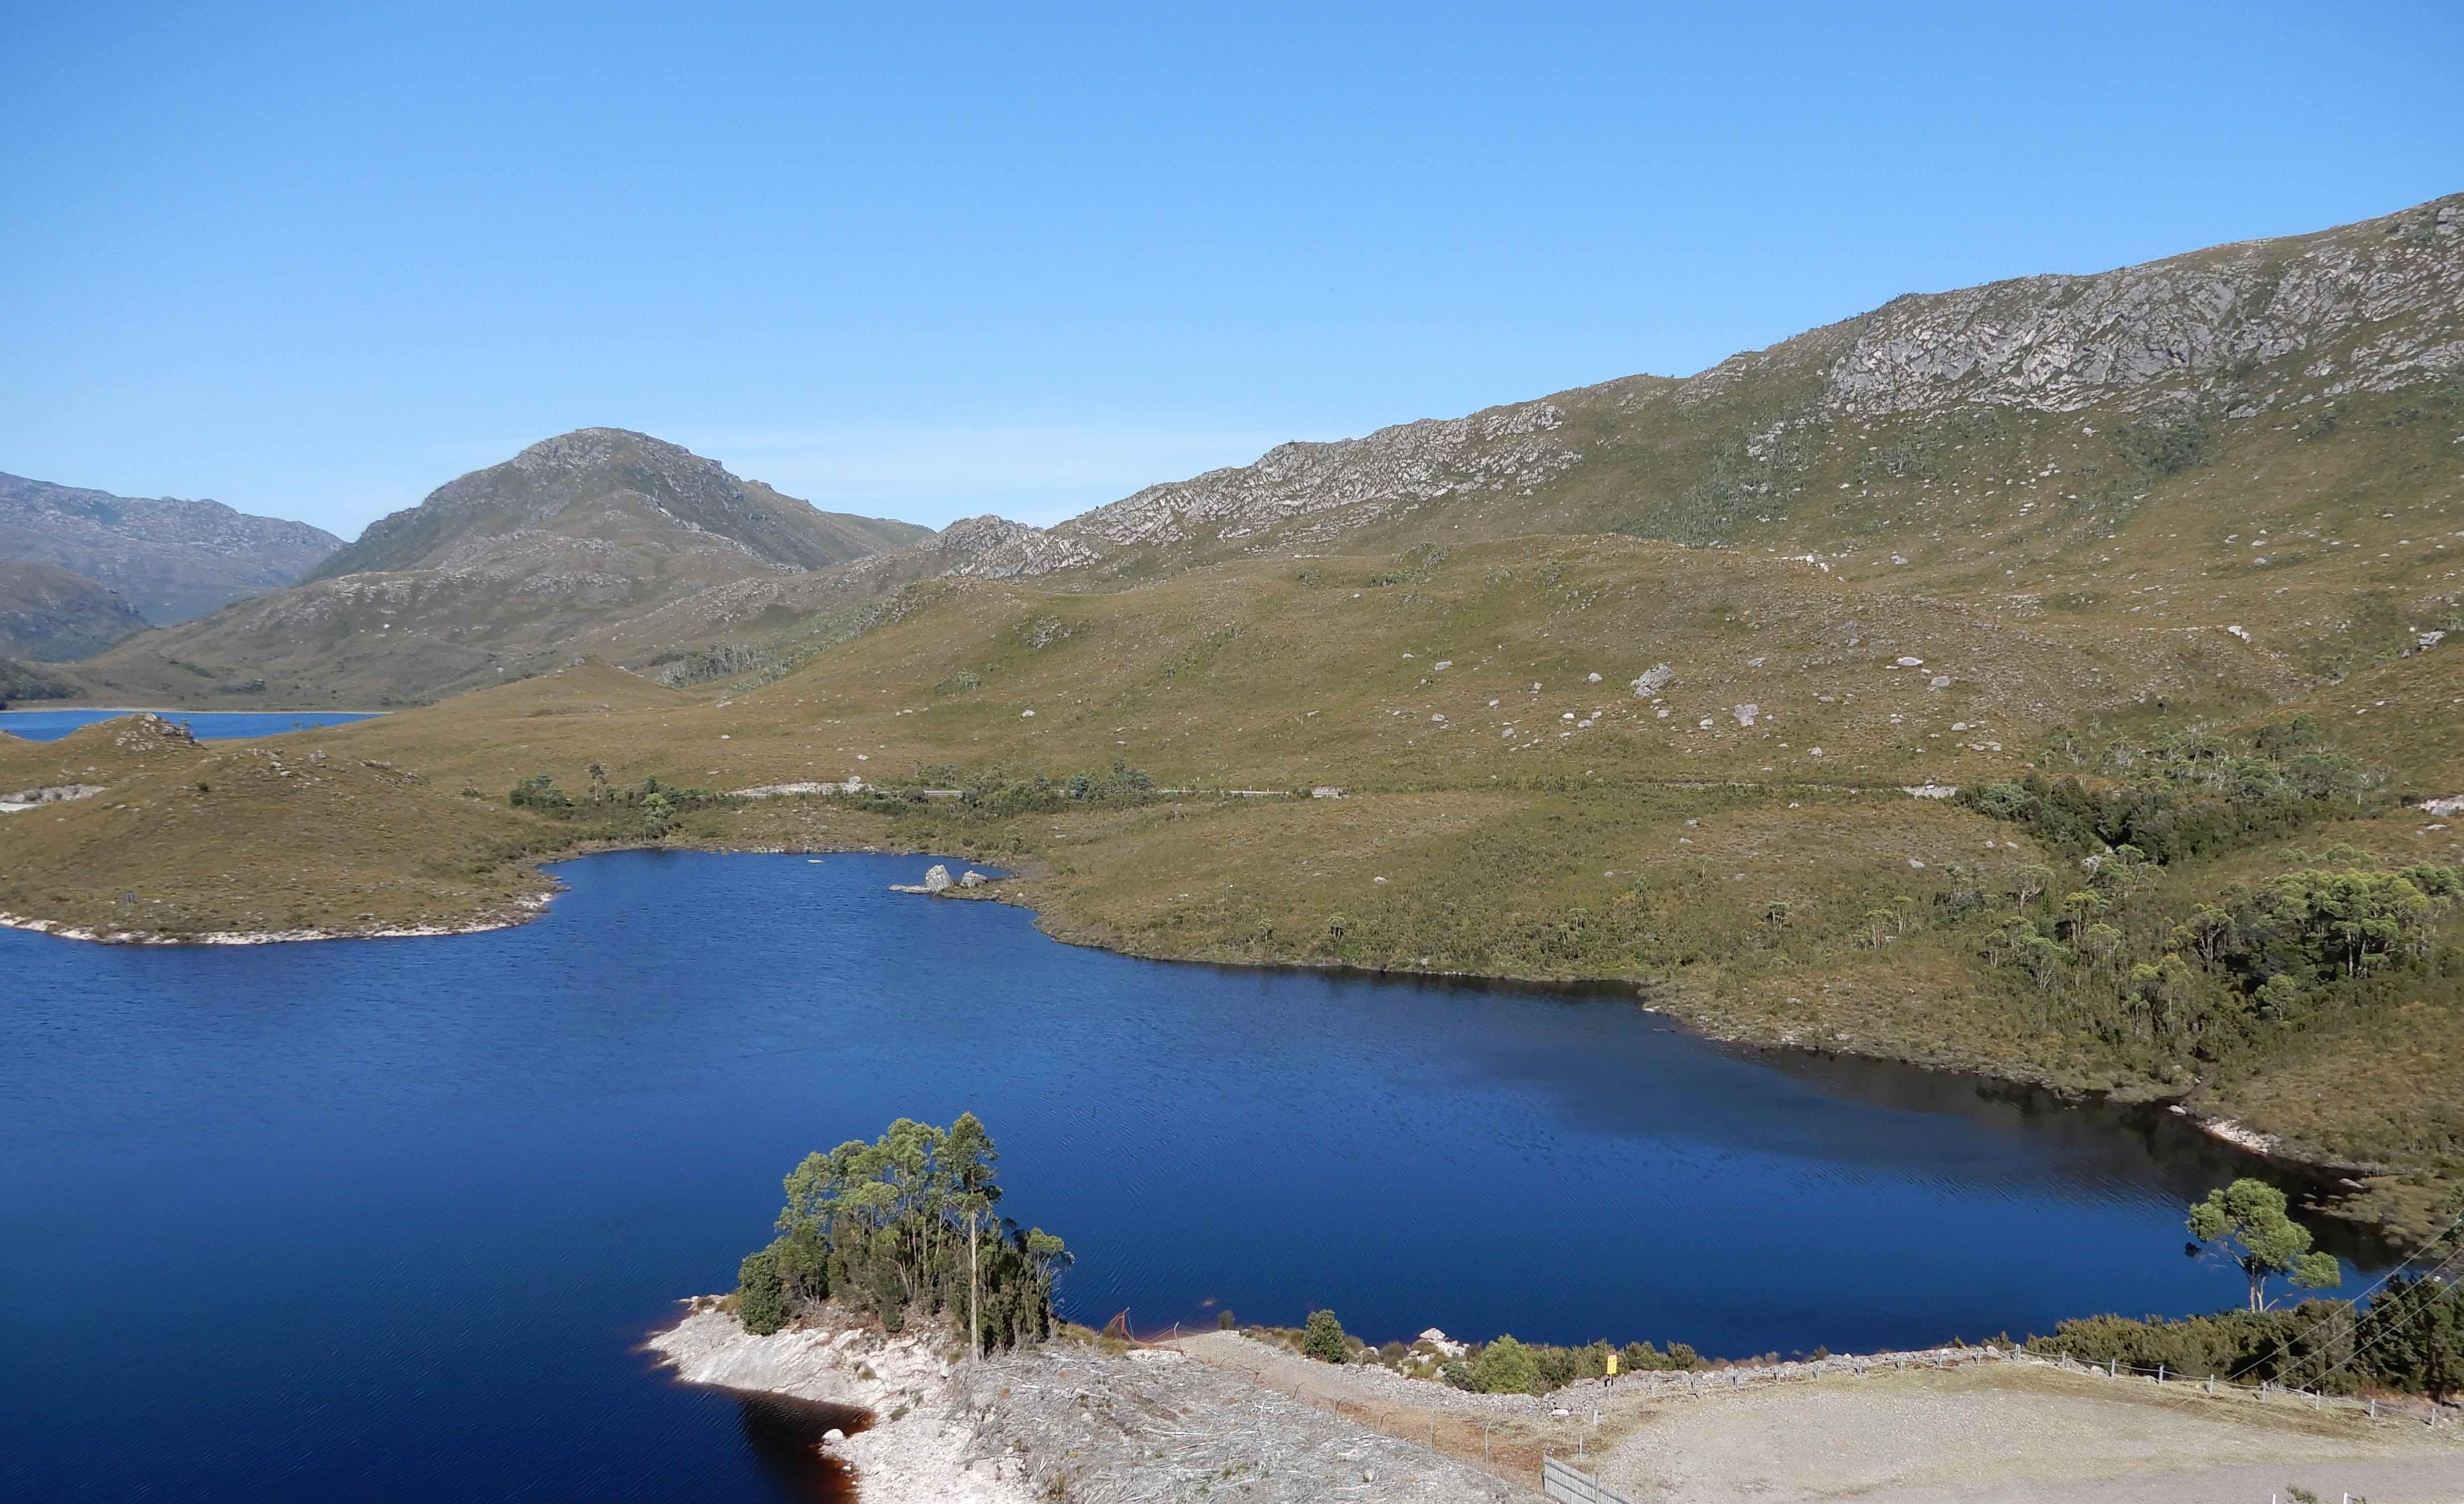 3.Lake Plimsoll